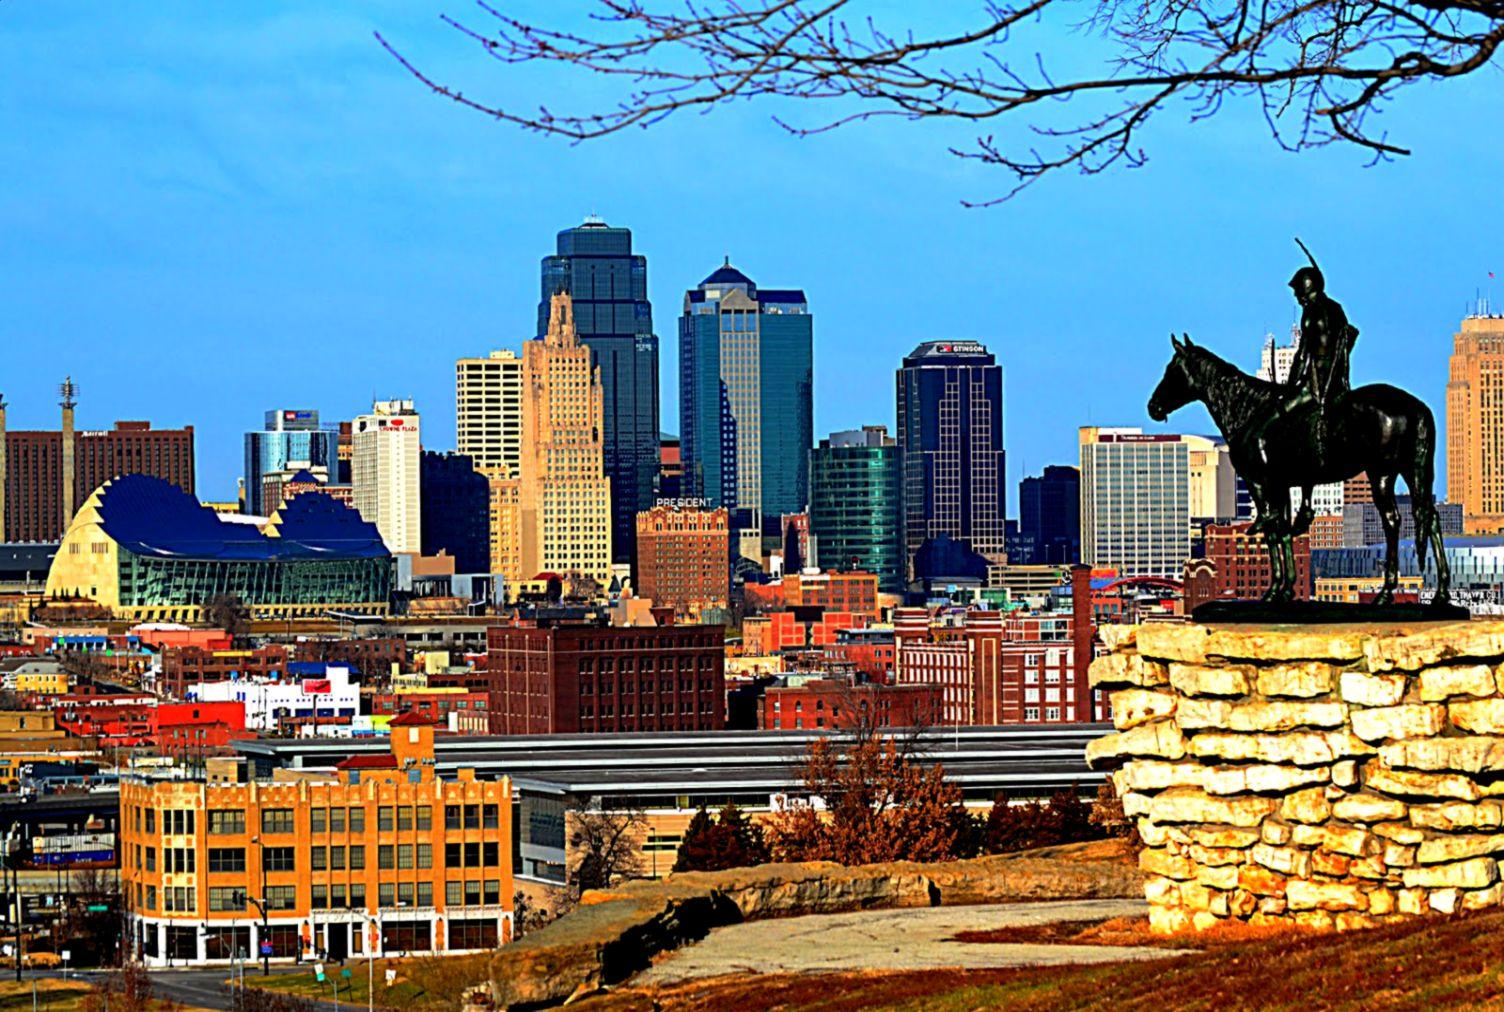 Kansas City Skyline Wallpaper 2016 Hd HD Wallpapers Gallery 1504x1012